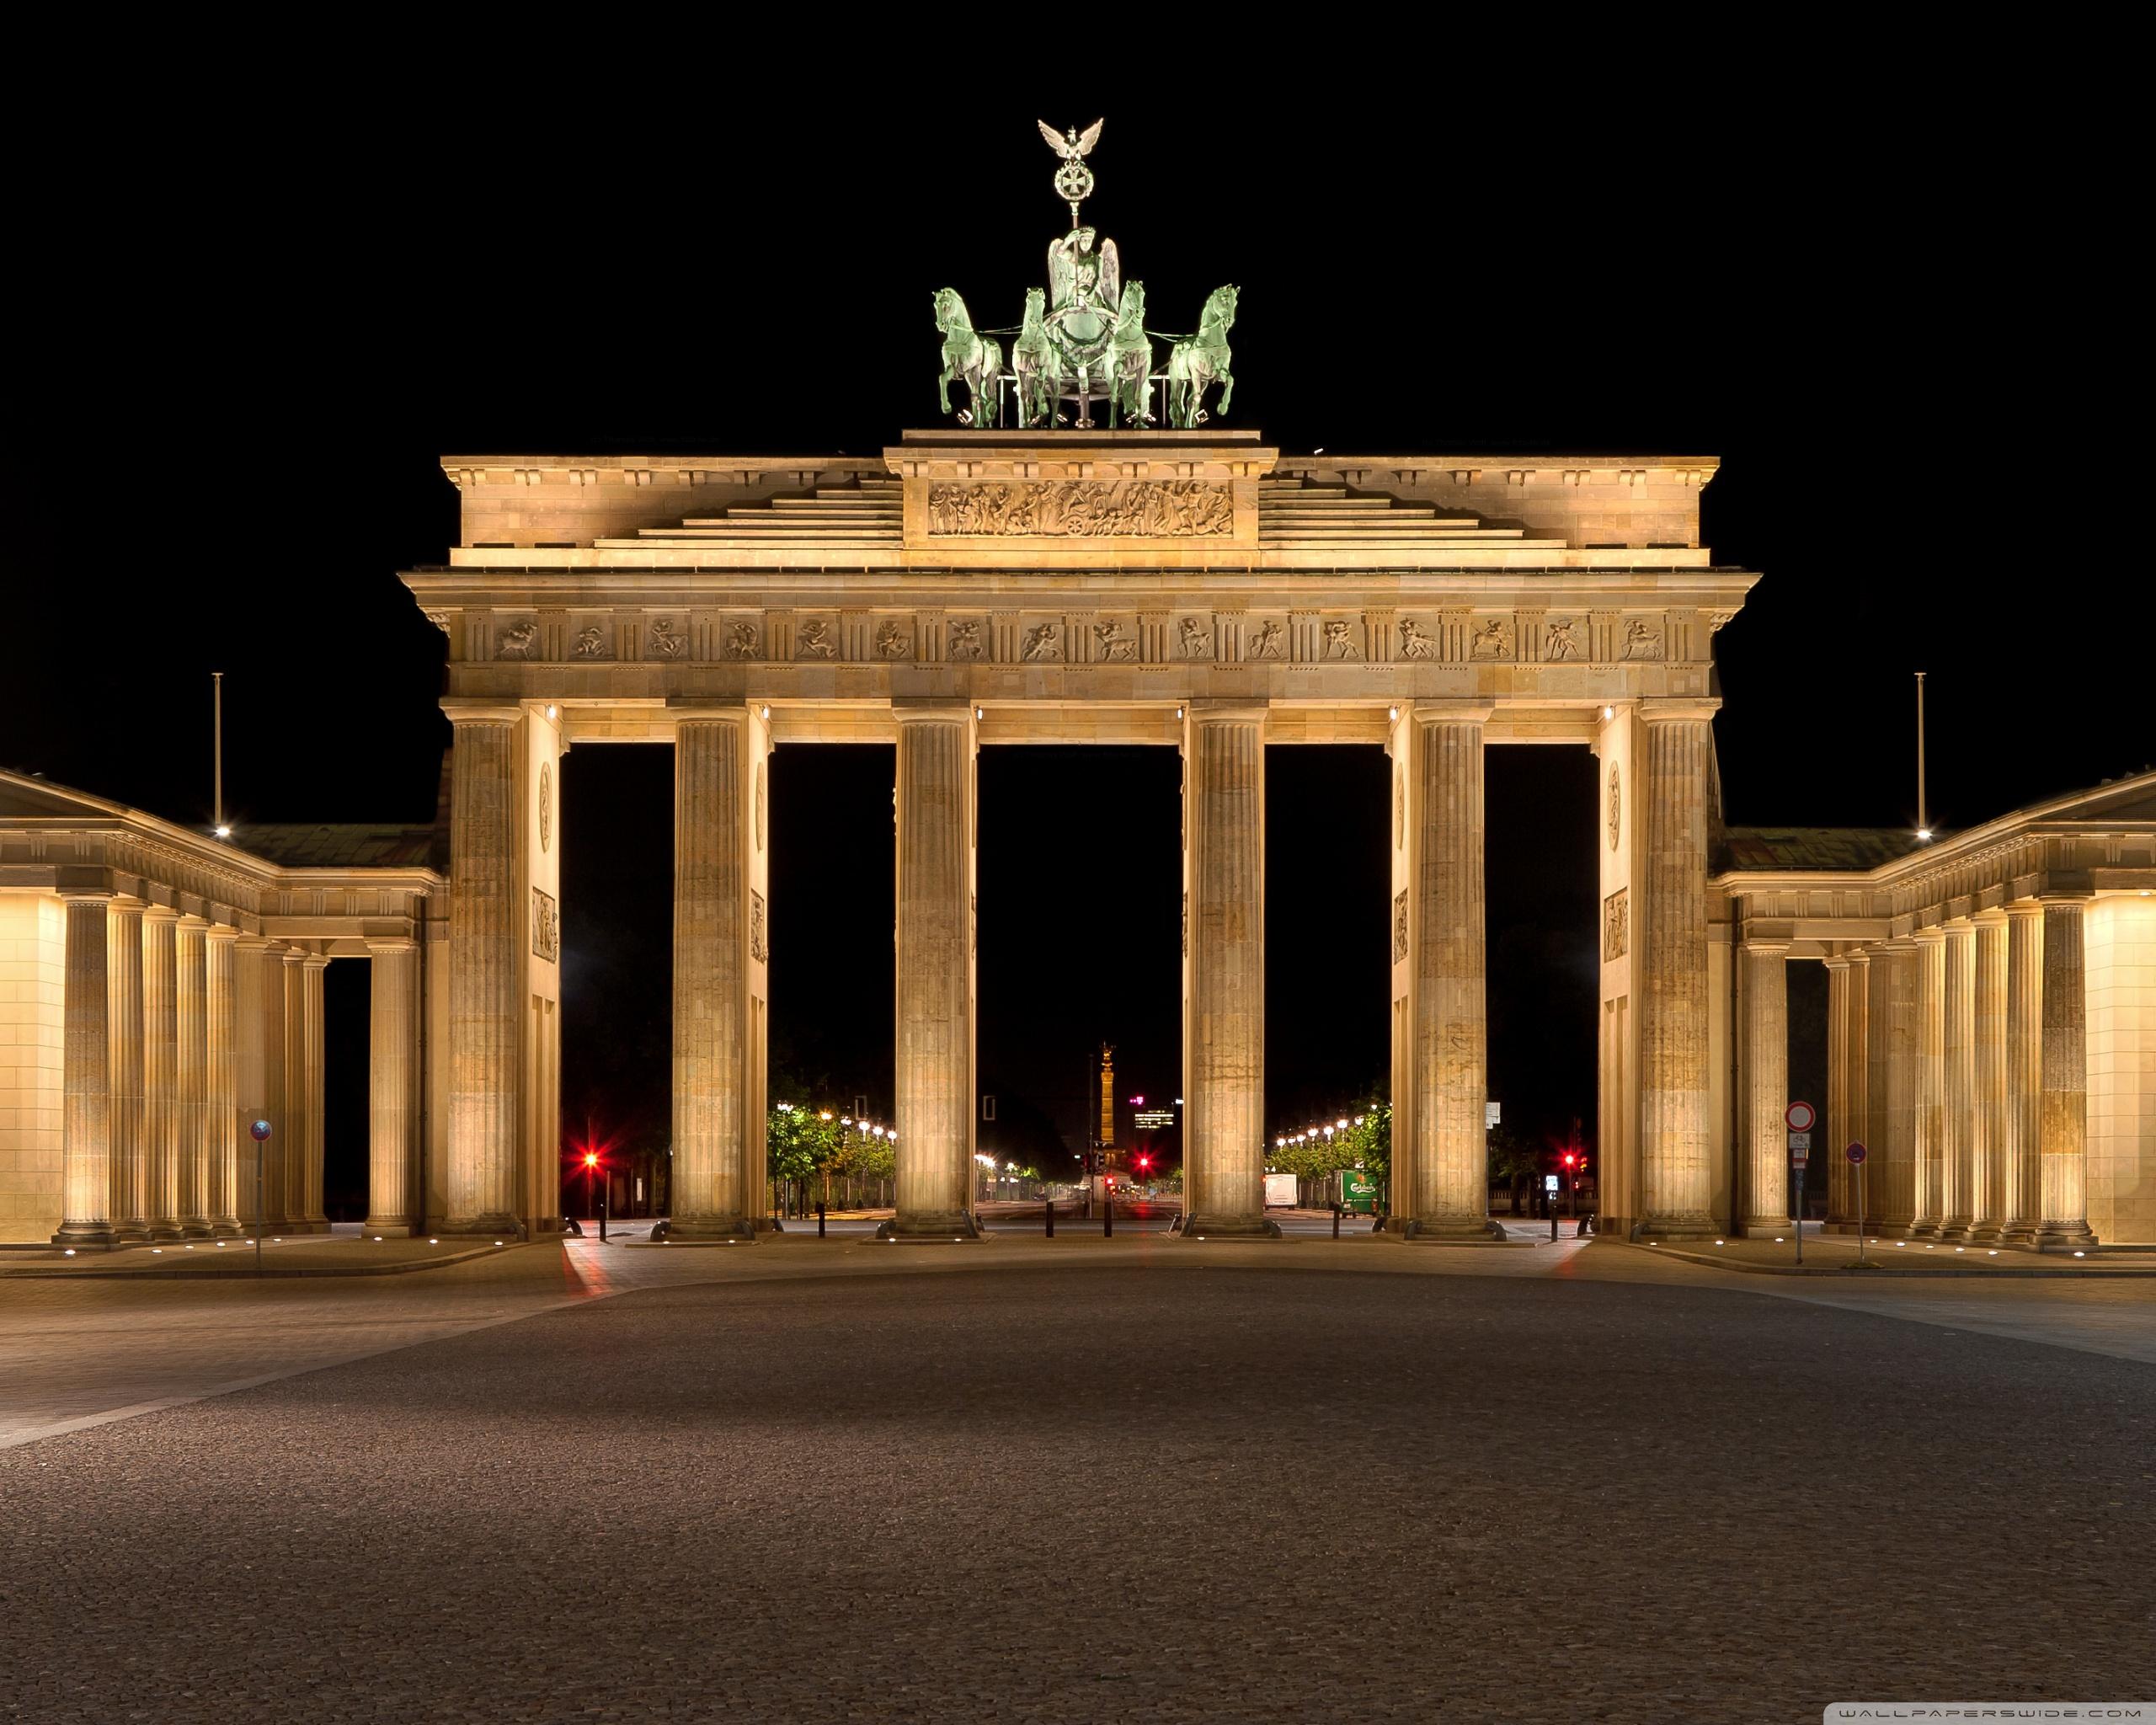 Brandenburg Gate 4K HD Desktop Wallpaper for 4K Ultra HD TV 2560x2048